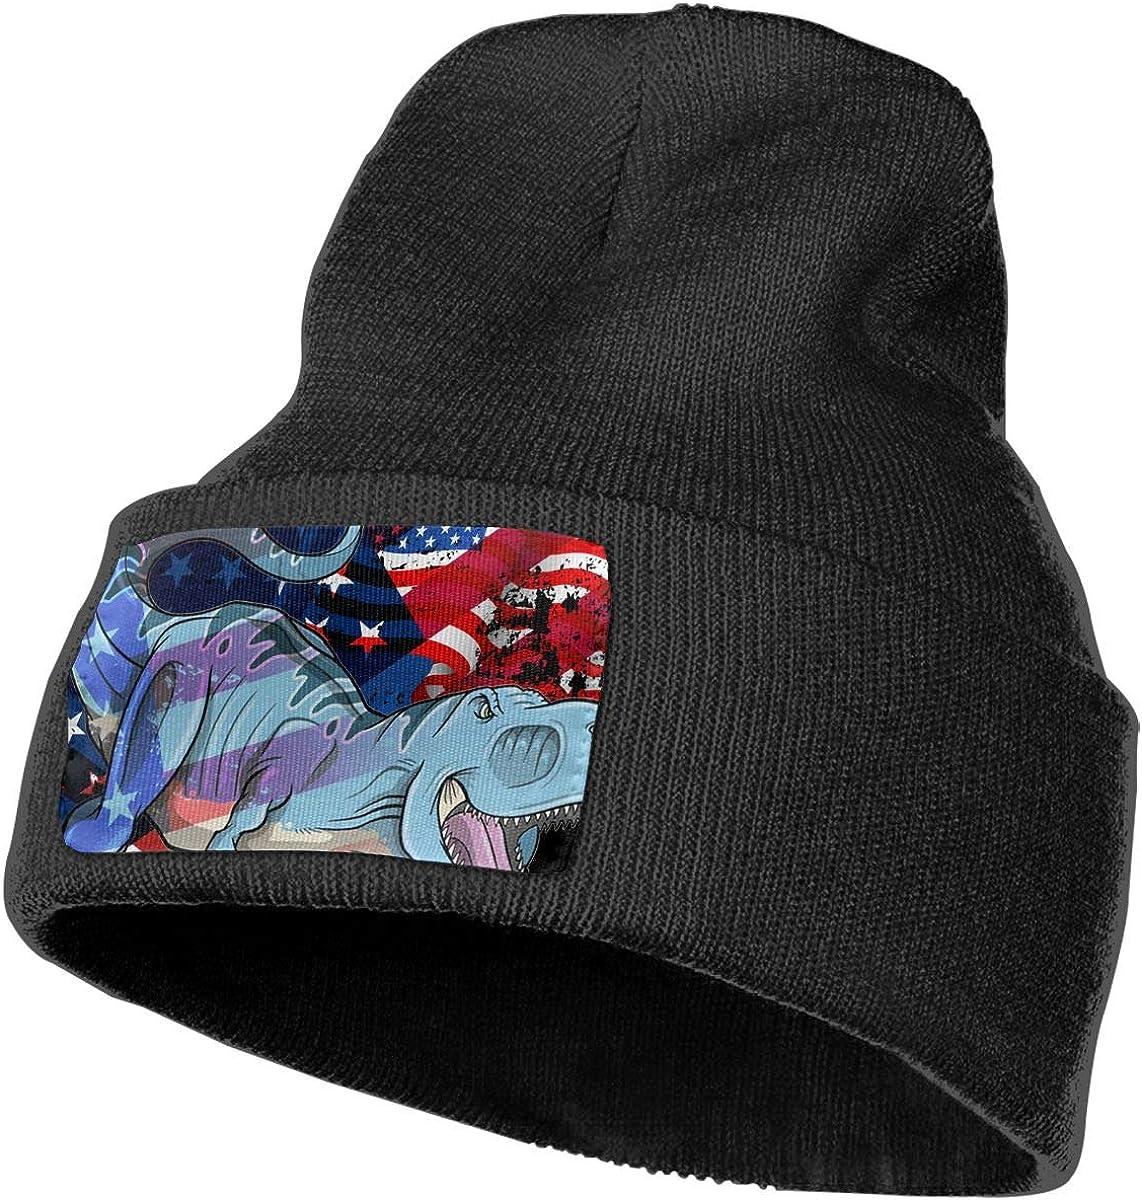 100/% Acrylic Acid Mas Beanie Hat Ruin Growling Dinosaurs Fashion Knitting Hat for Men Women